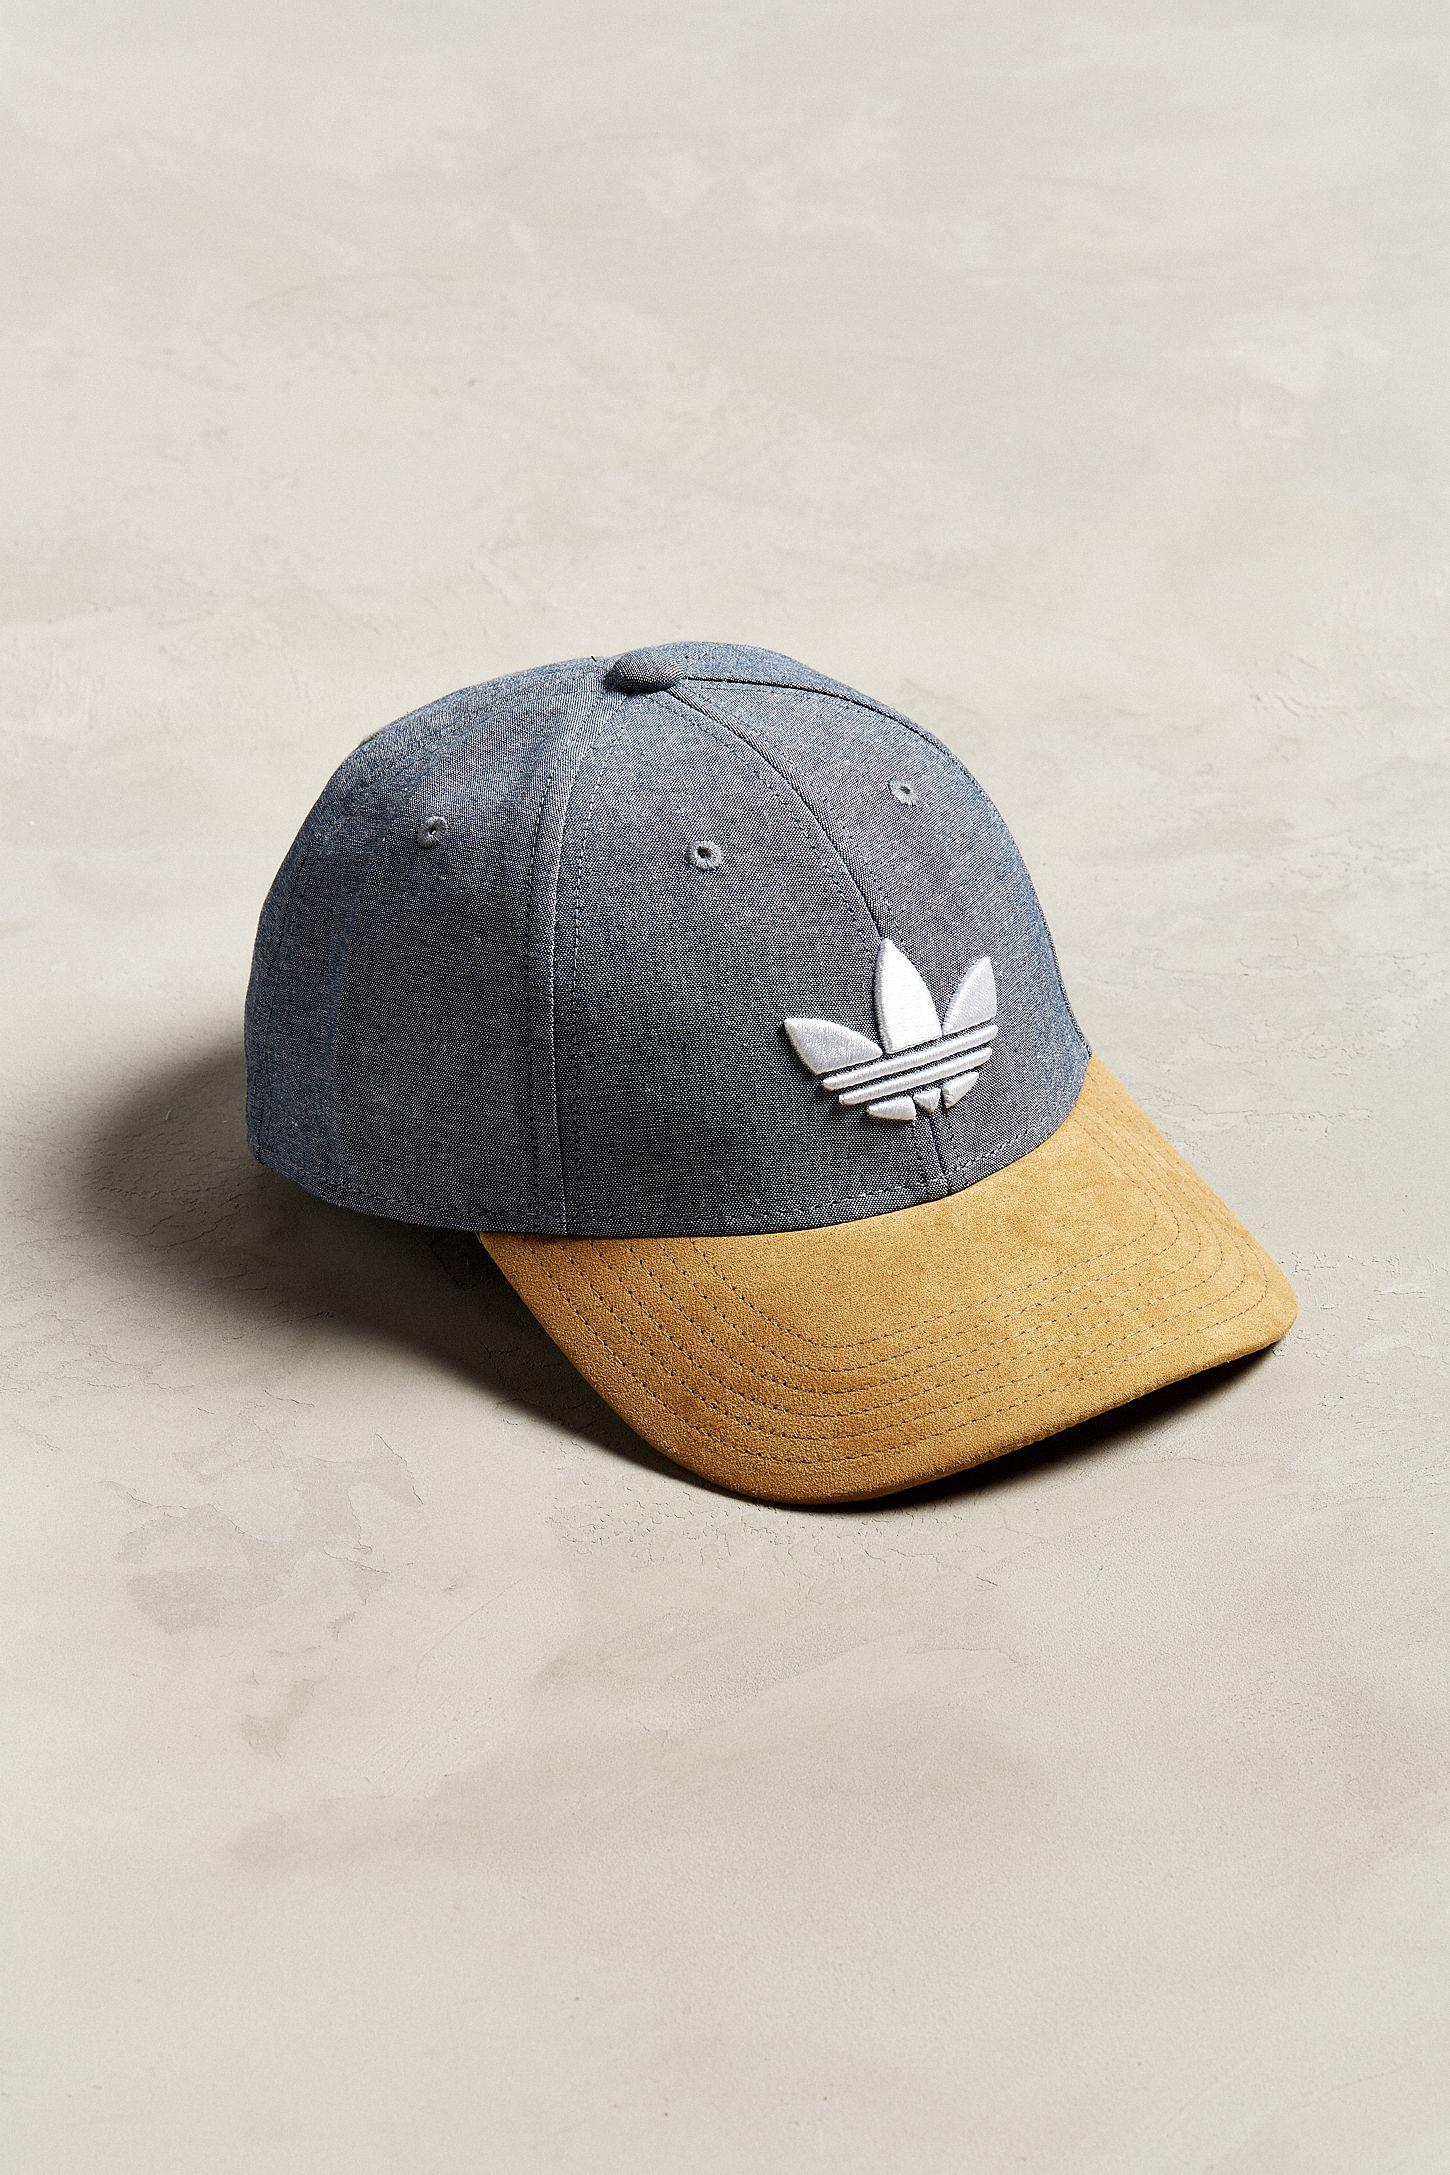 dff70e80b8a adidas Originals Trefoil Plus Snapback Hat